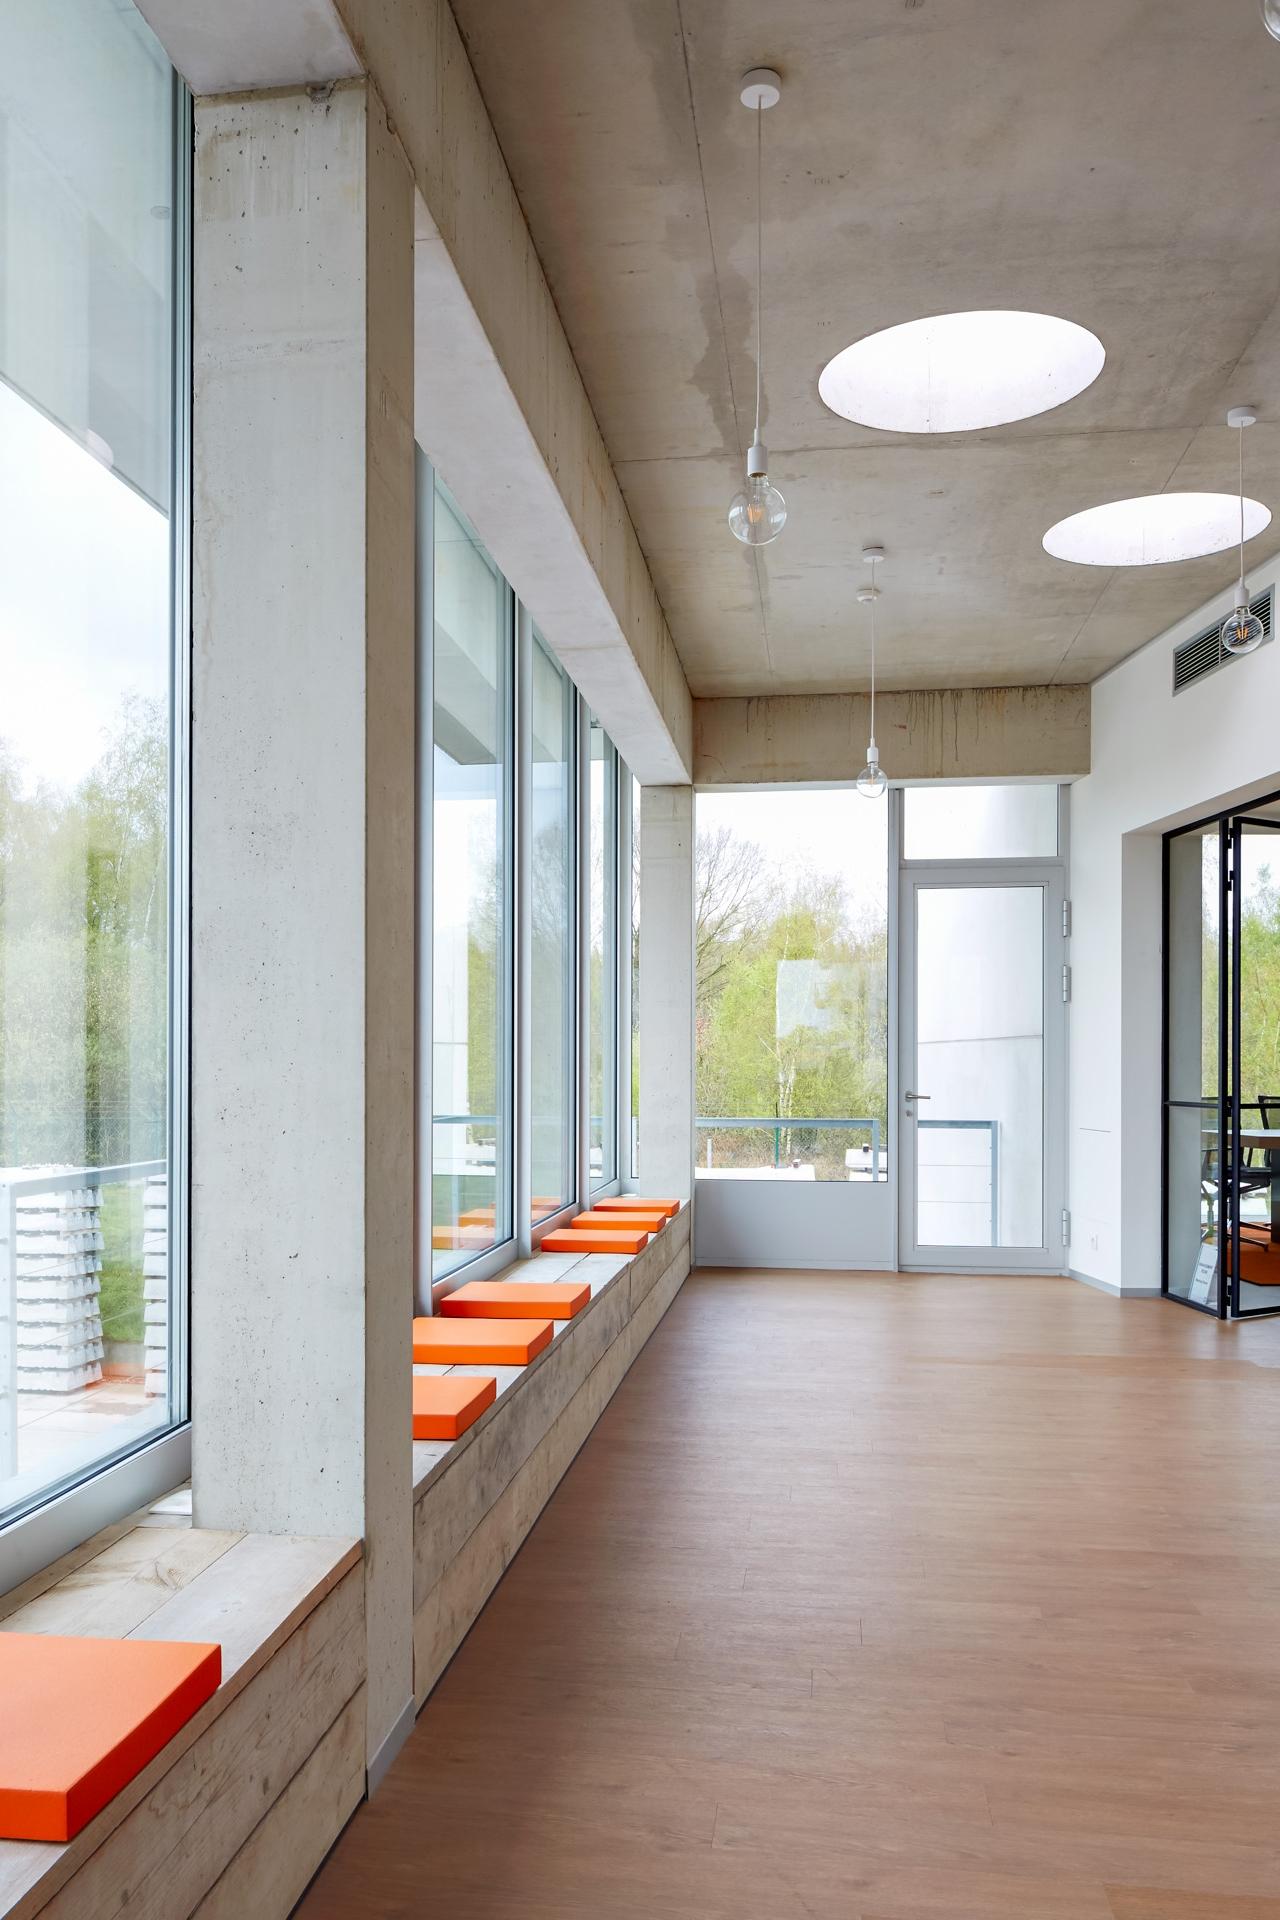 Laakdal | Betonnen interieur met lichtkoepels en zitbank